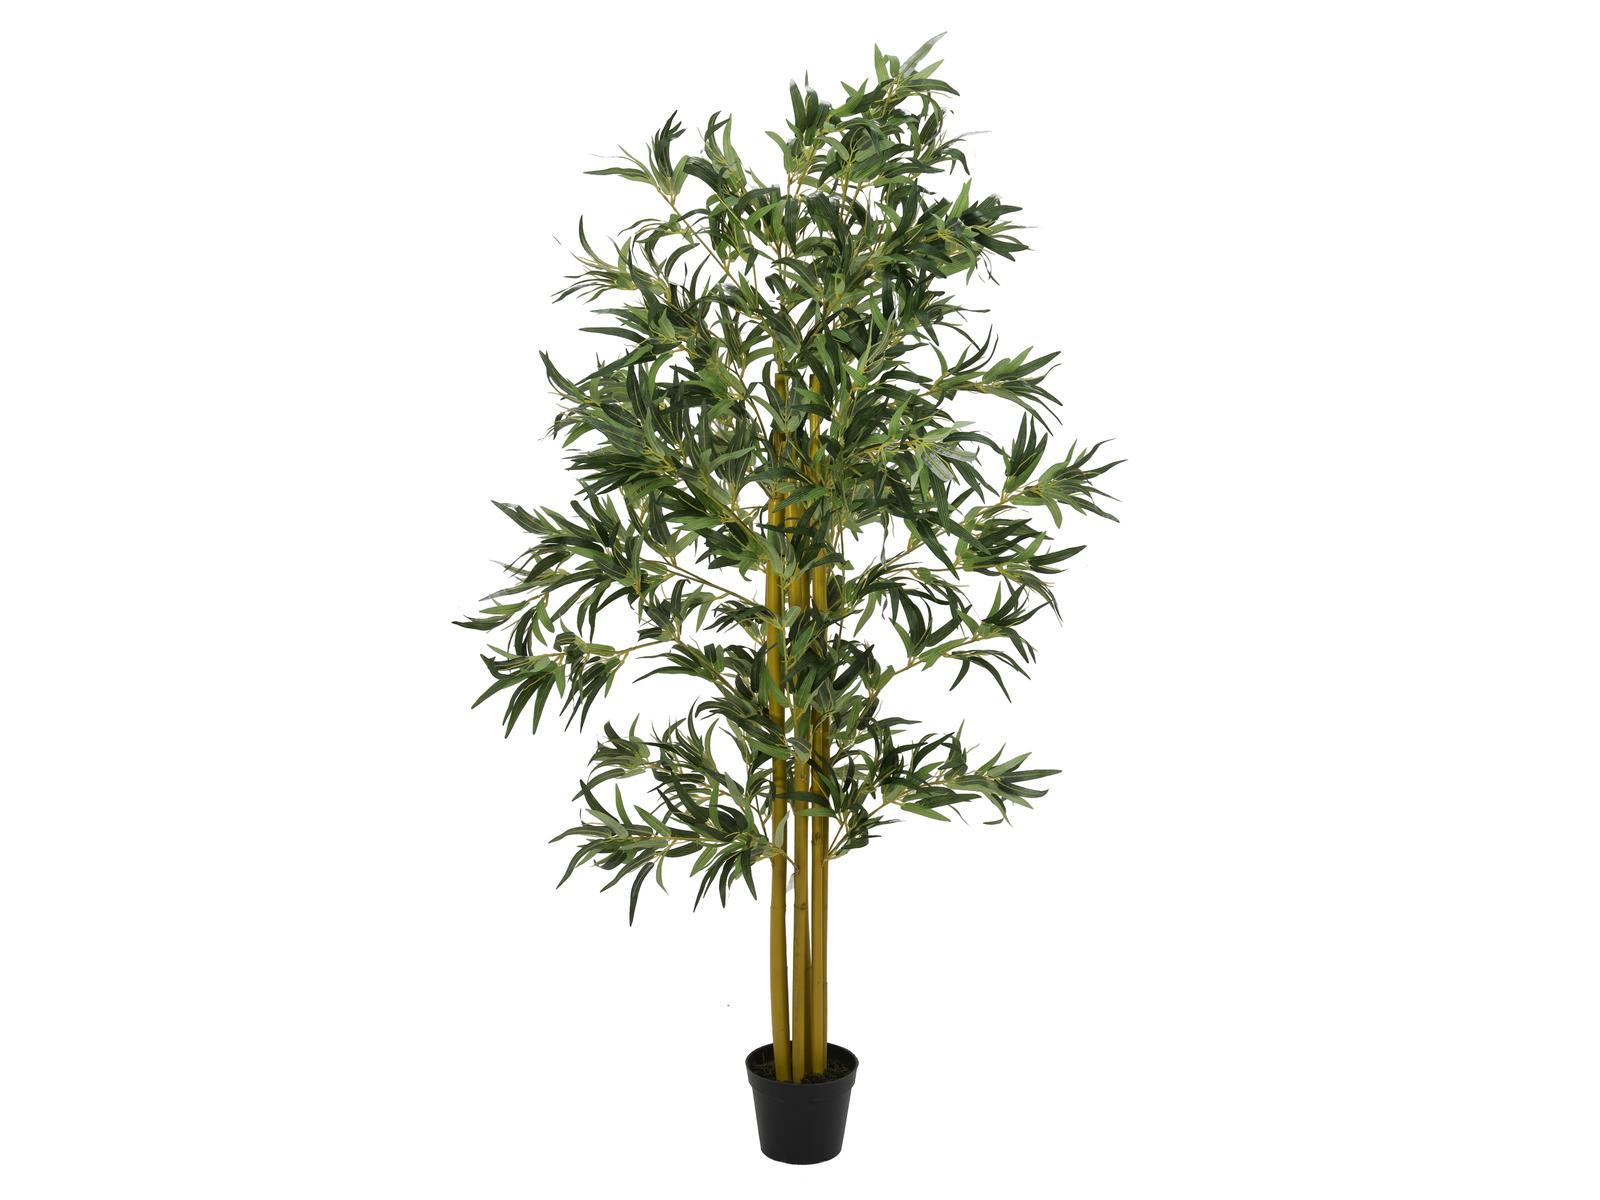 EUROPALMS Bambus Multistamm, Kunstpflanze, 180cm